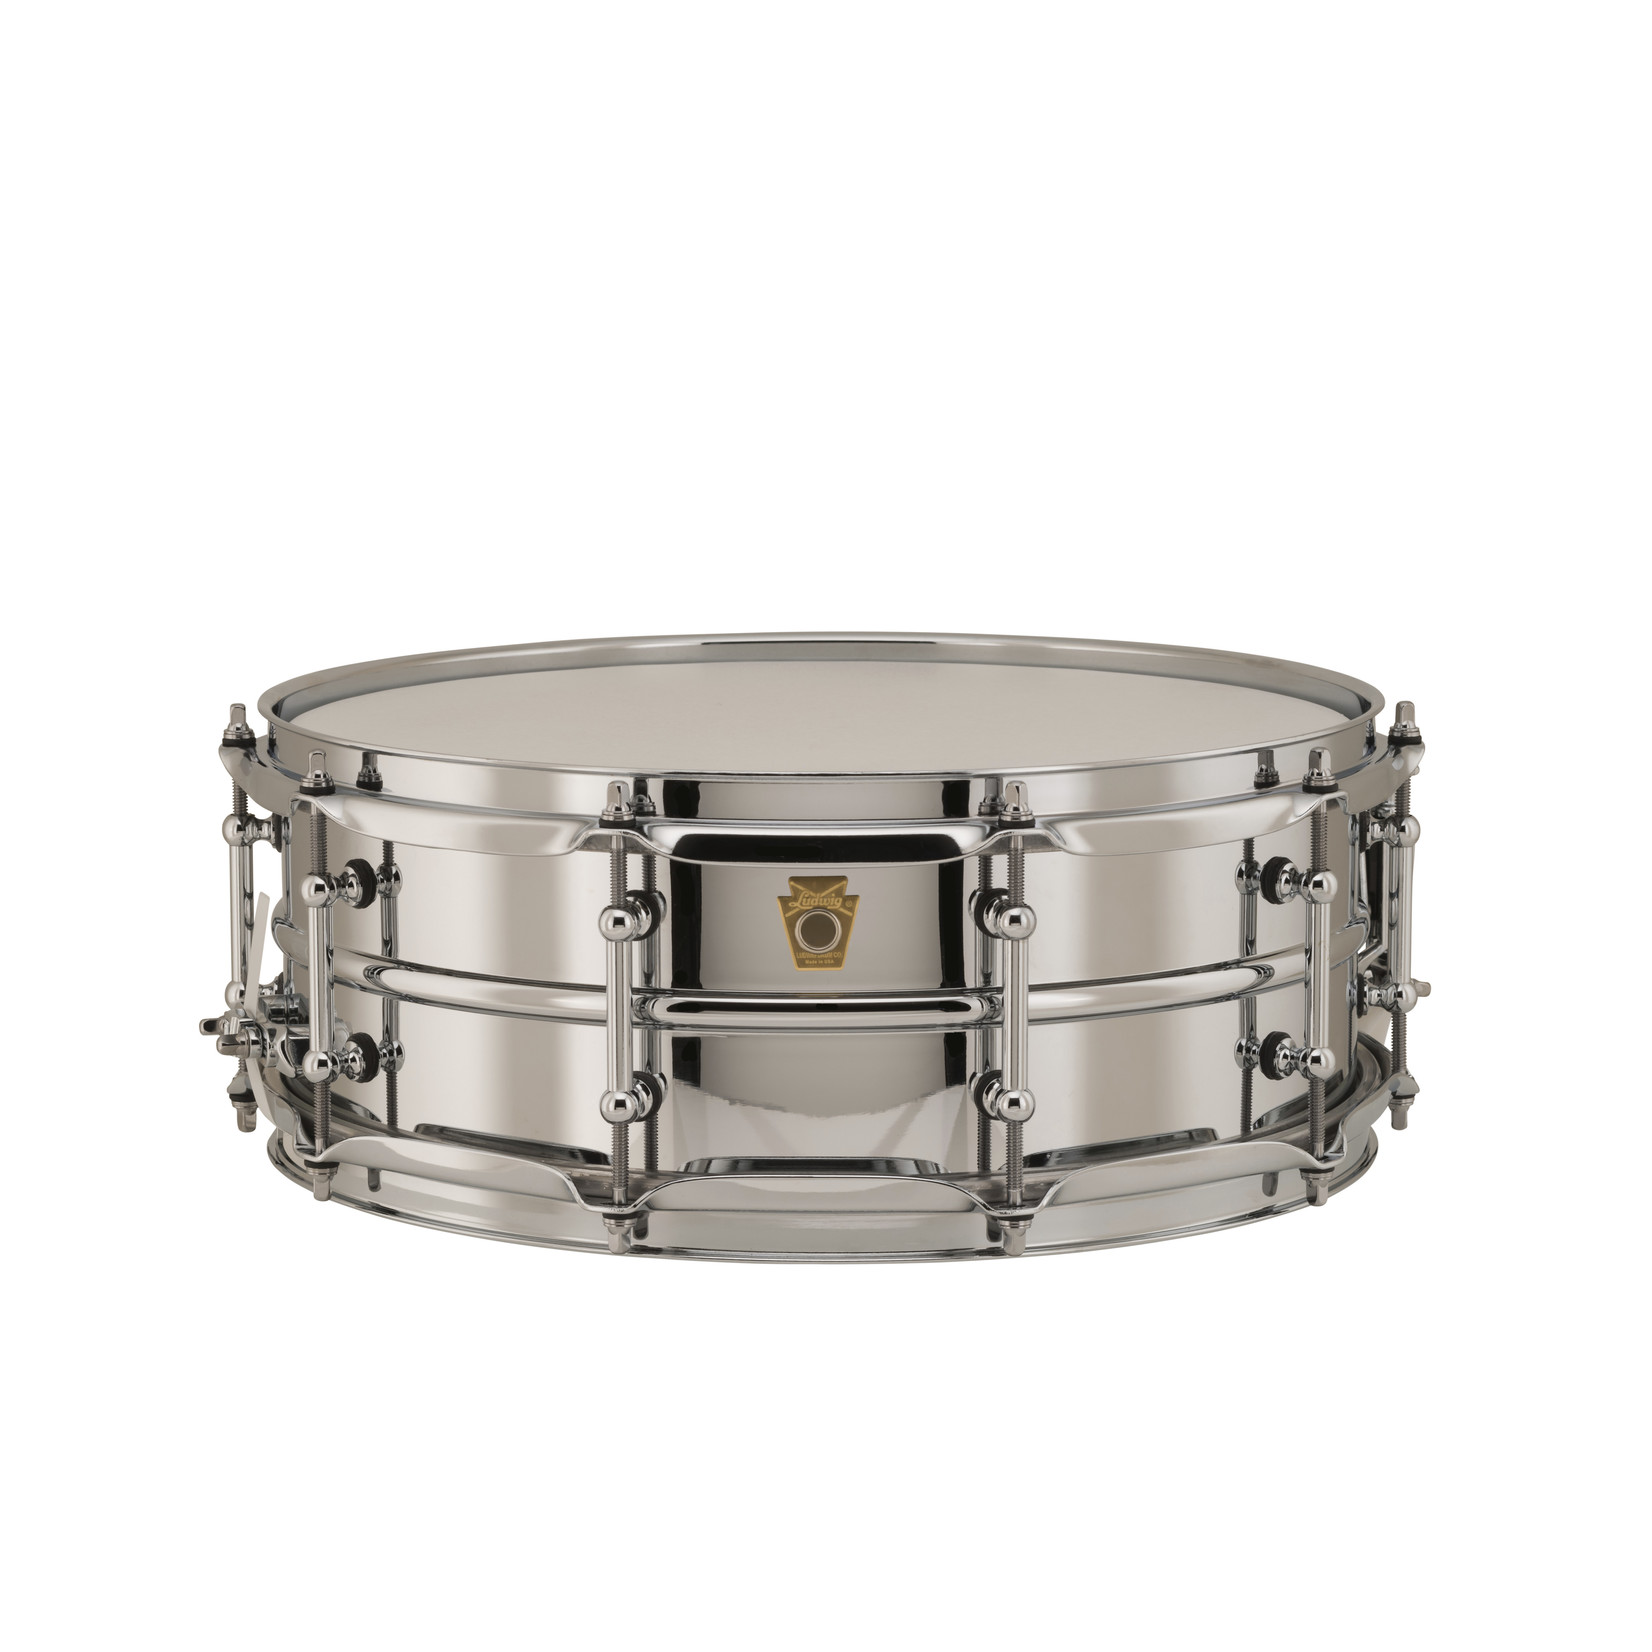 Ludwig Ludwig 5X14 Supraphonic Chrome over Brass Snare Drum / Tube Lugs / Chrome Hardware